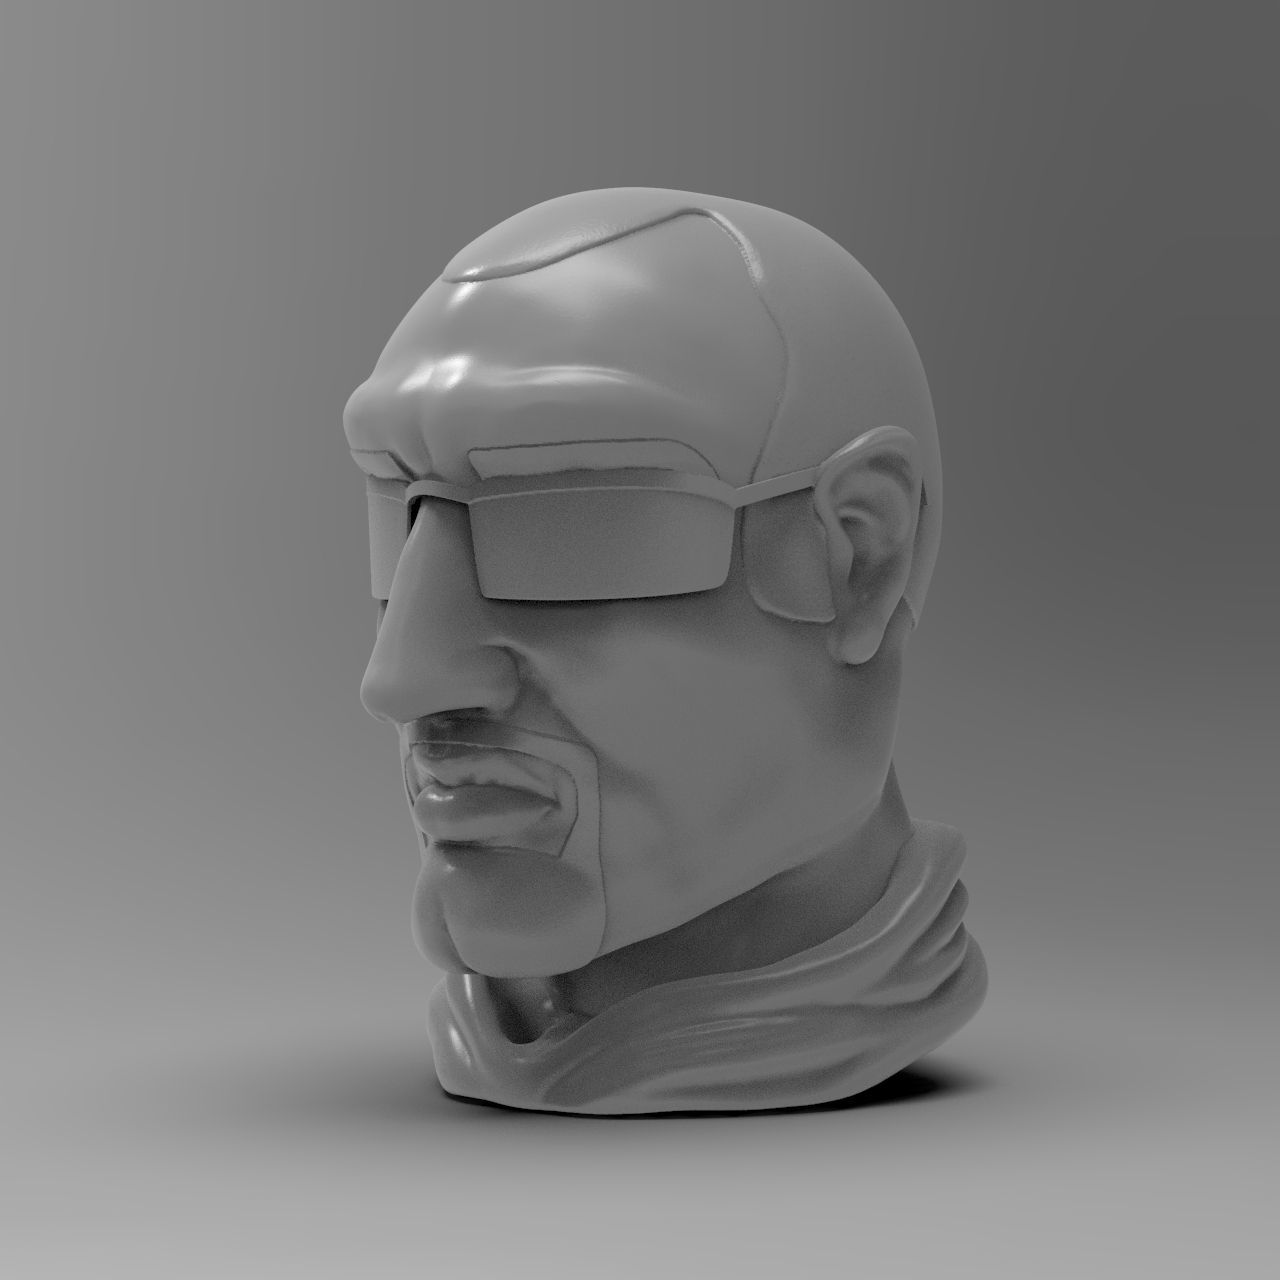 Boomber 3D - meme